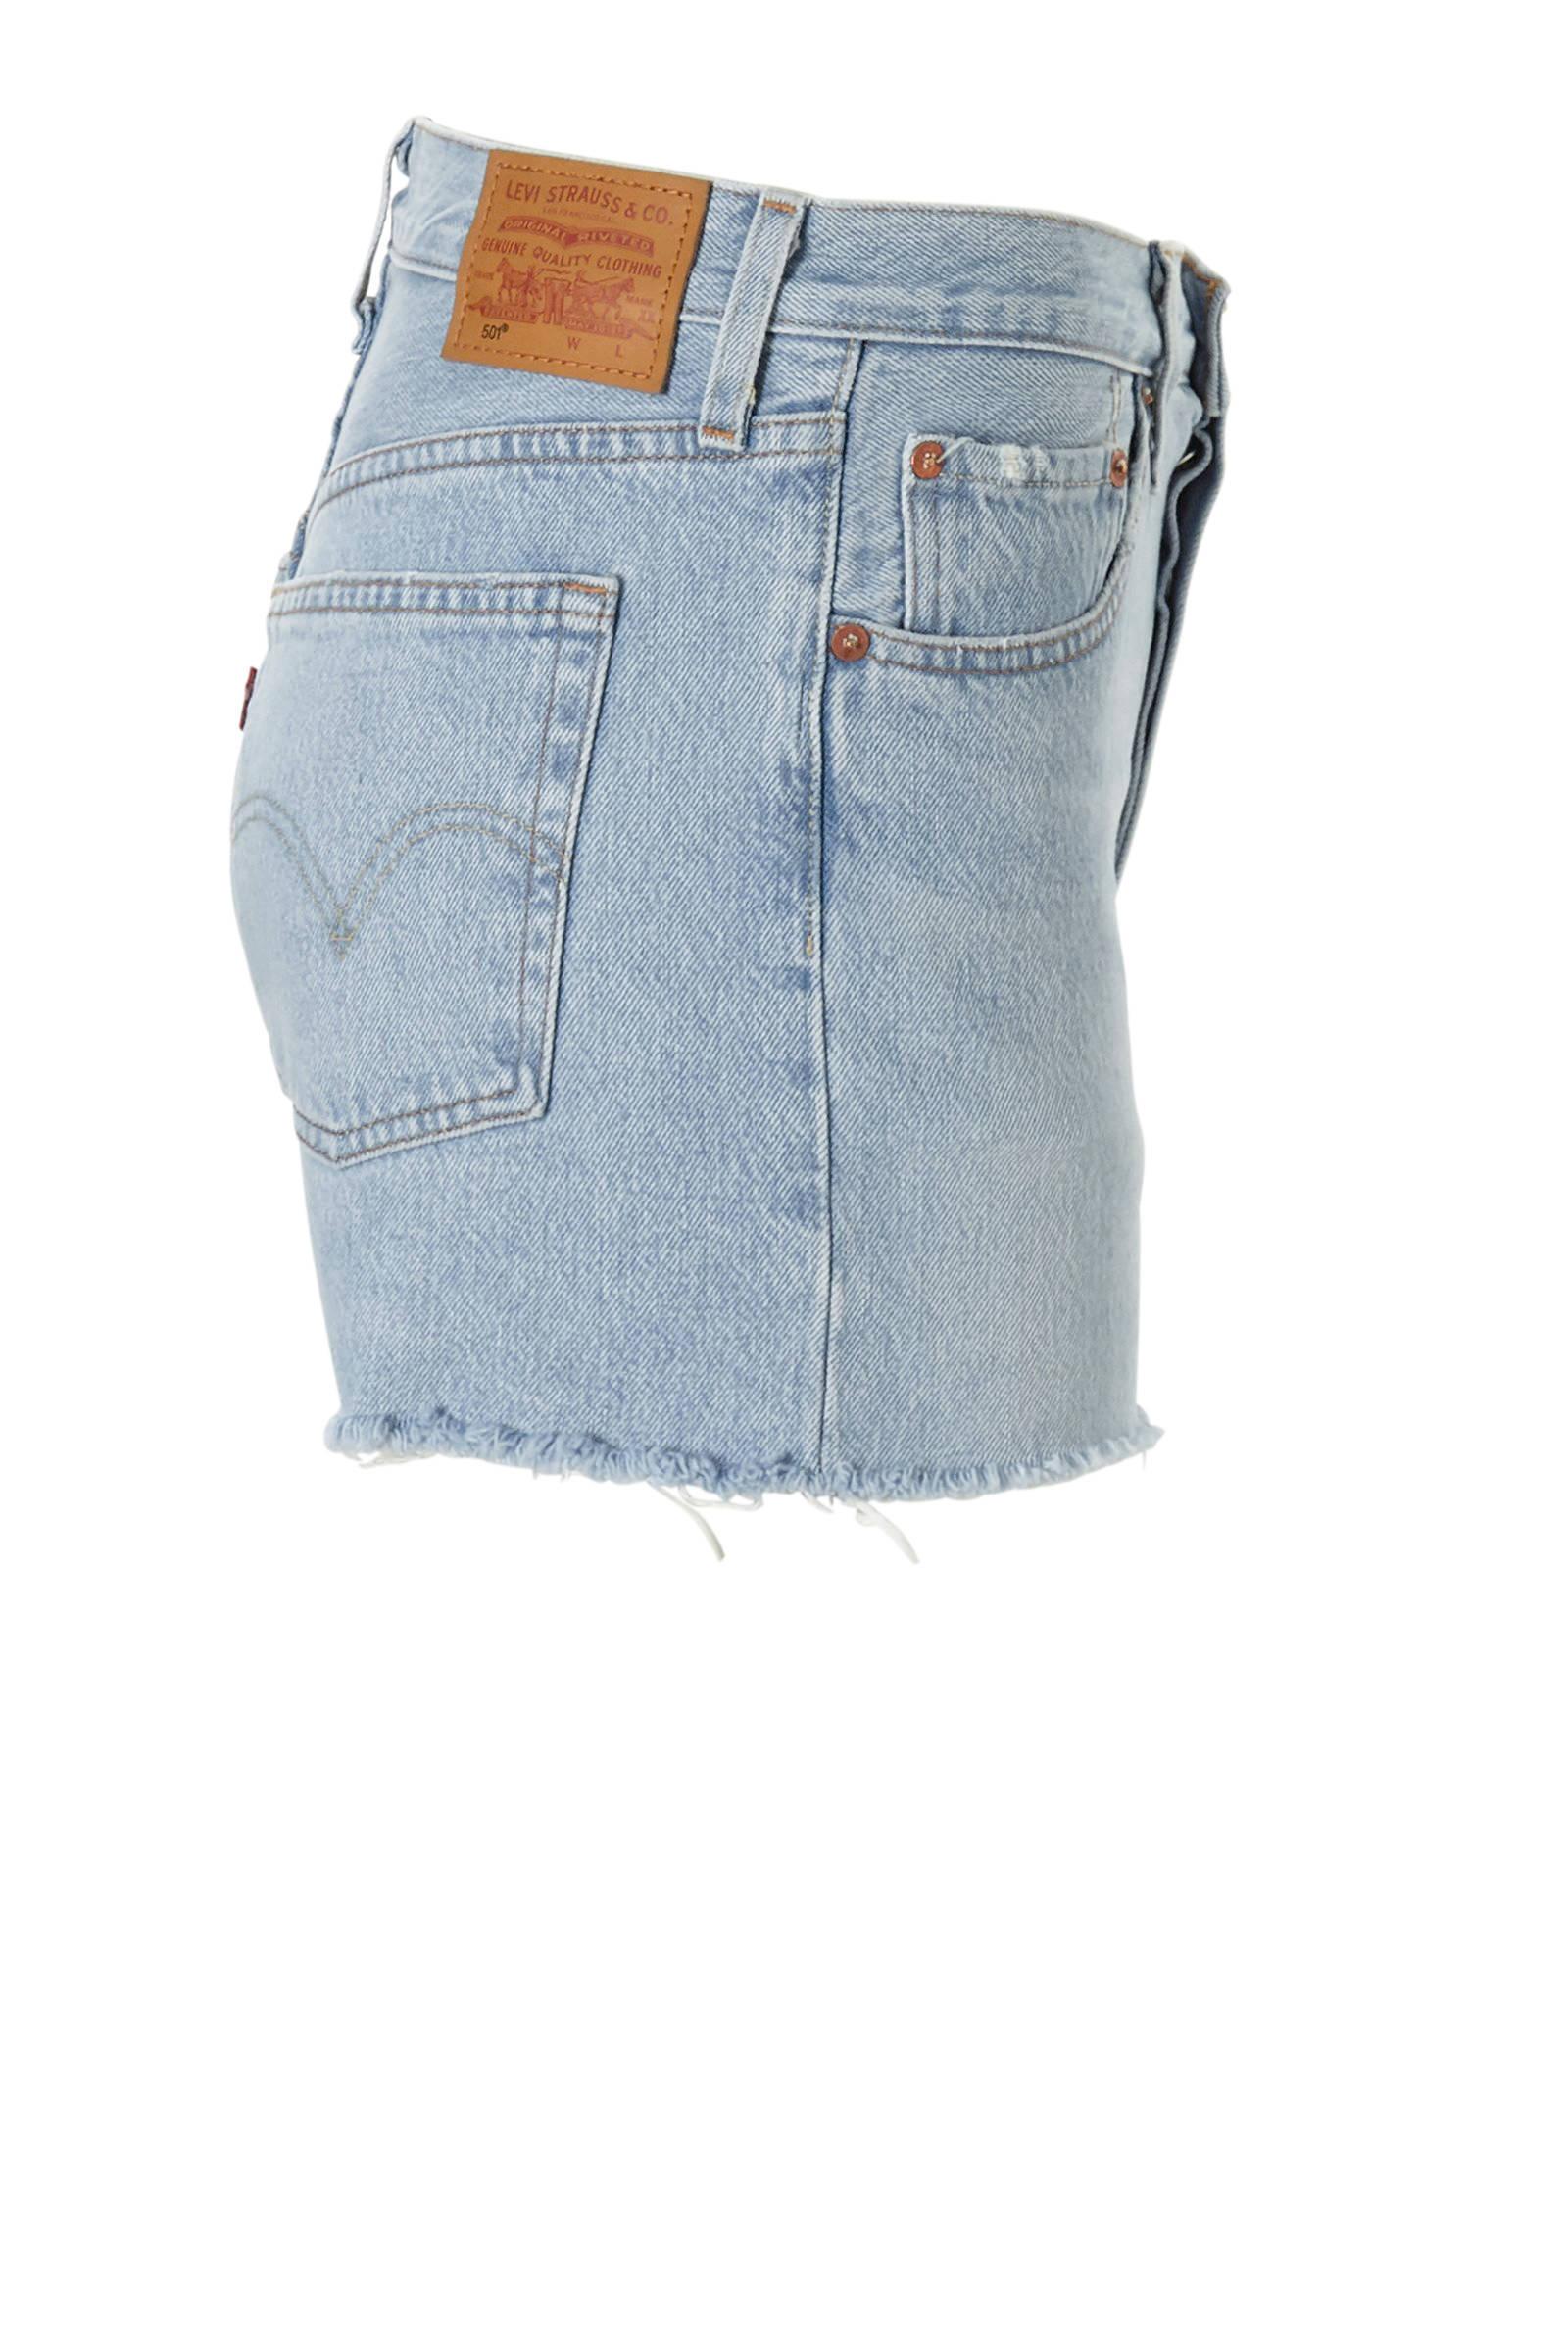 Levi's 501 high waisted jeans shorts | wehkamp